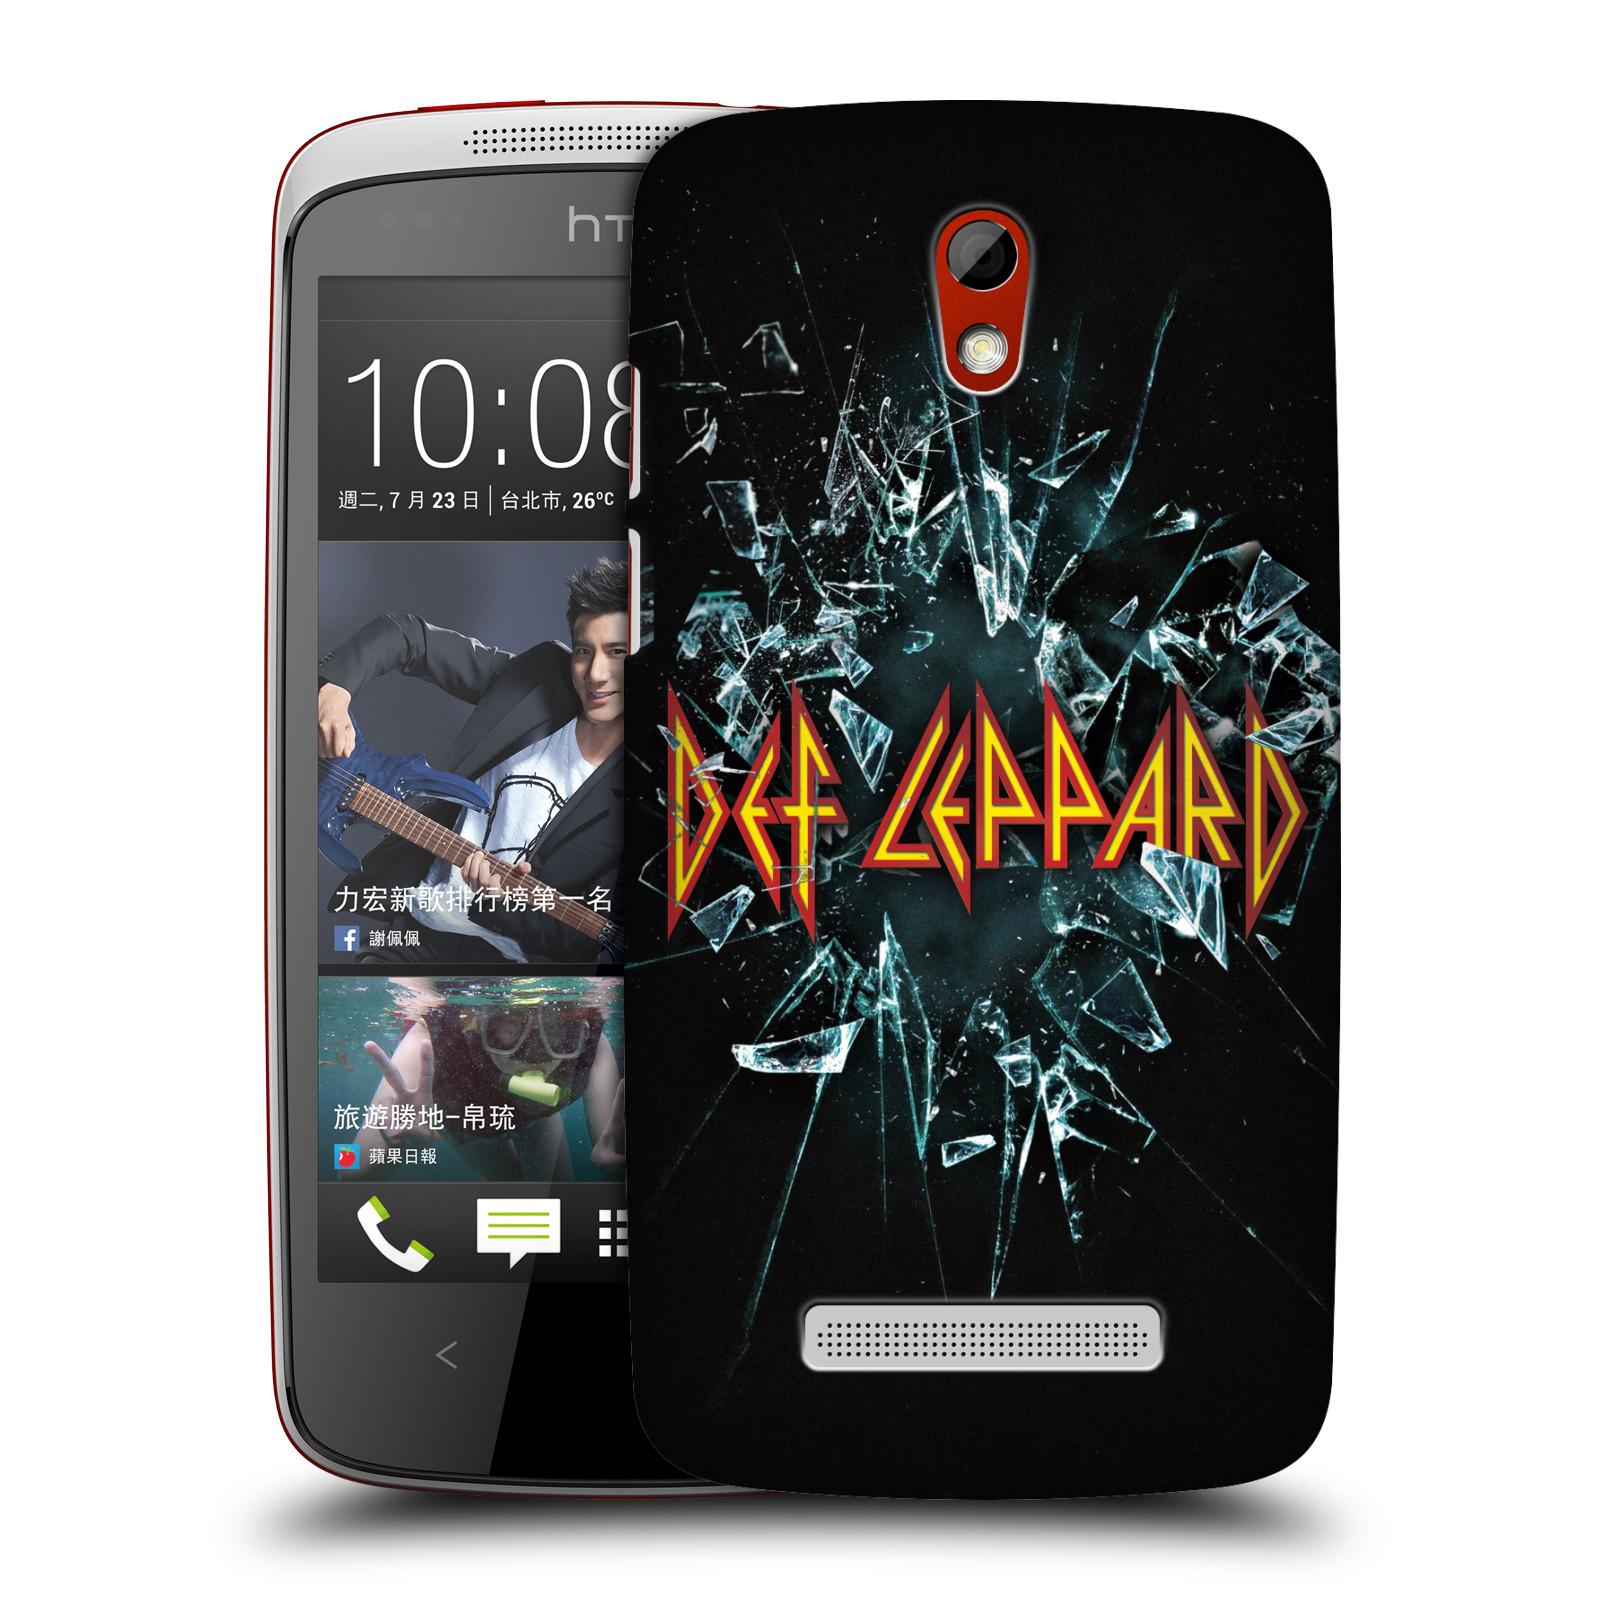 OFFICIAL-DEF-LEPPARD-ALBUMS-HARD-BACK-CASE-FOR-HTC-PHONES-2